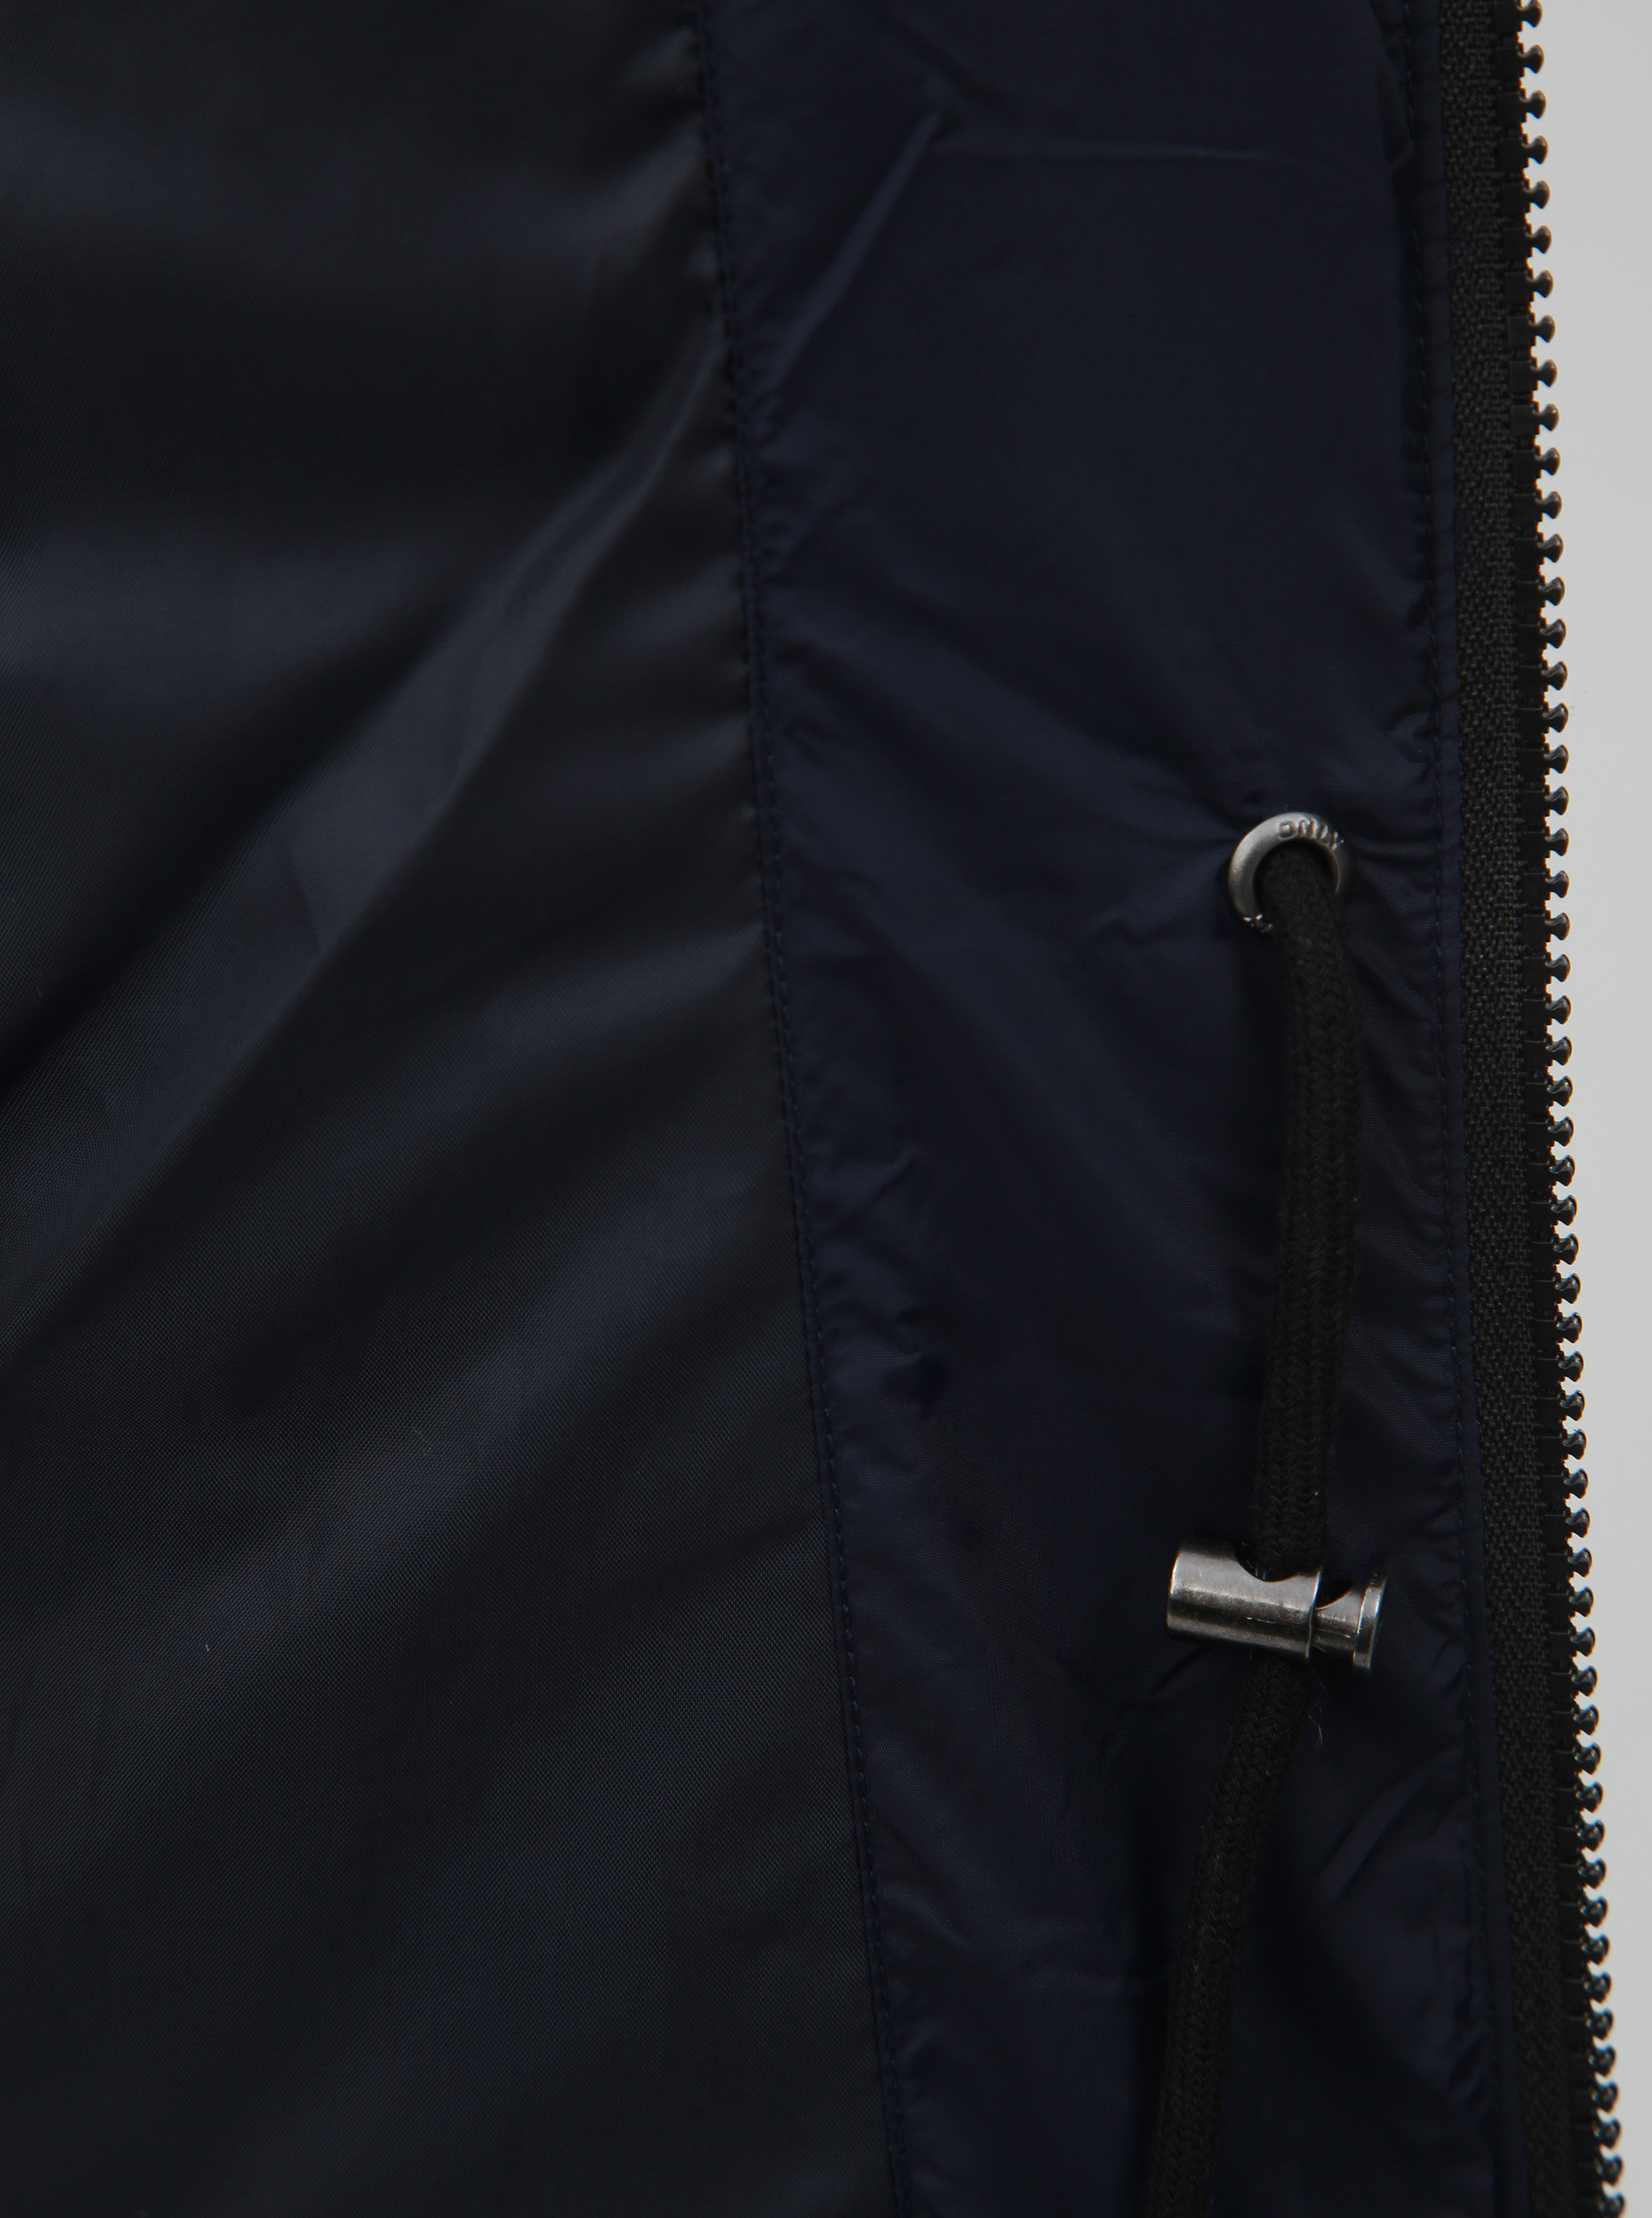 Tmavomodrý prešívaný zimný kabát s odnímateľnou kapucňou ONLY Newottowa ... 111c2631201